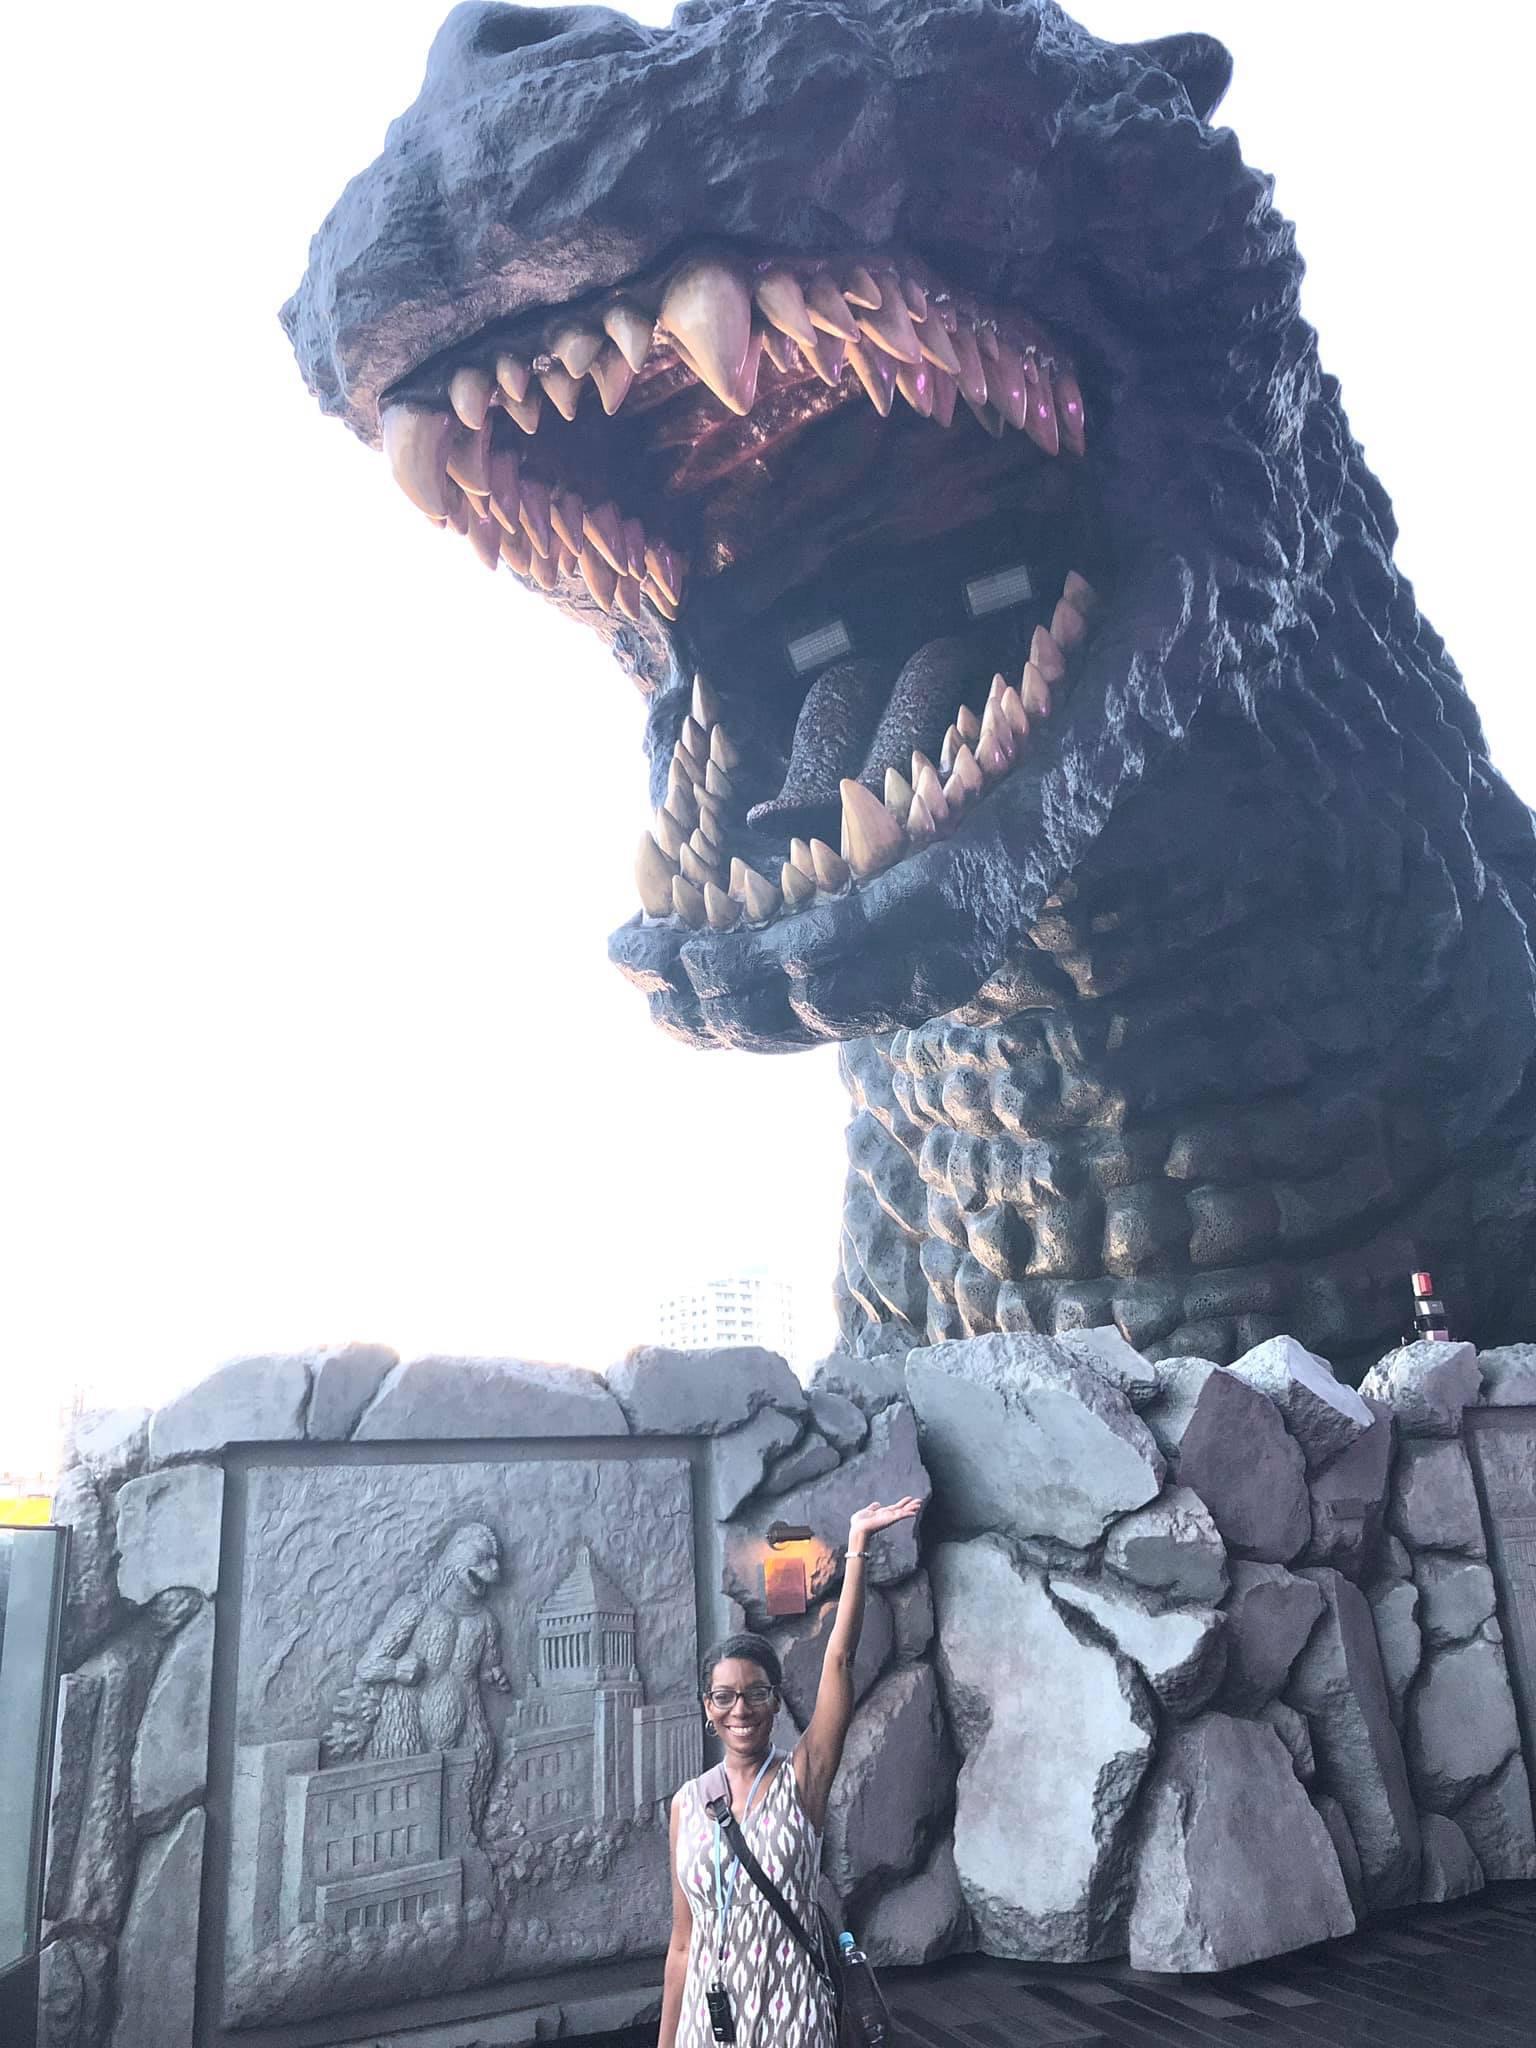 Me standing directly below the Godzilla head.